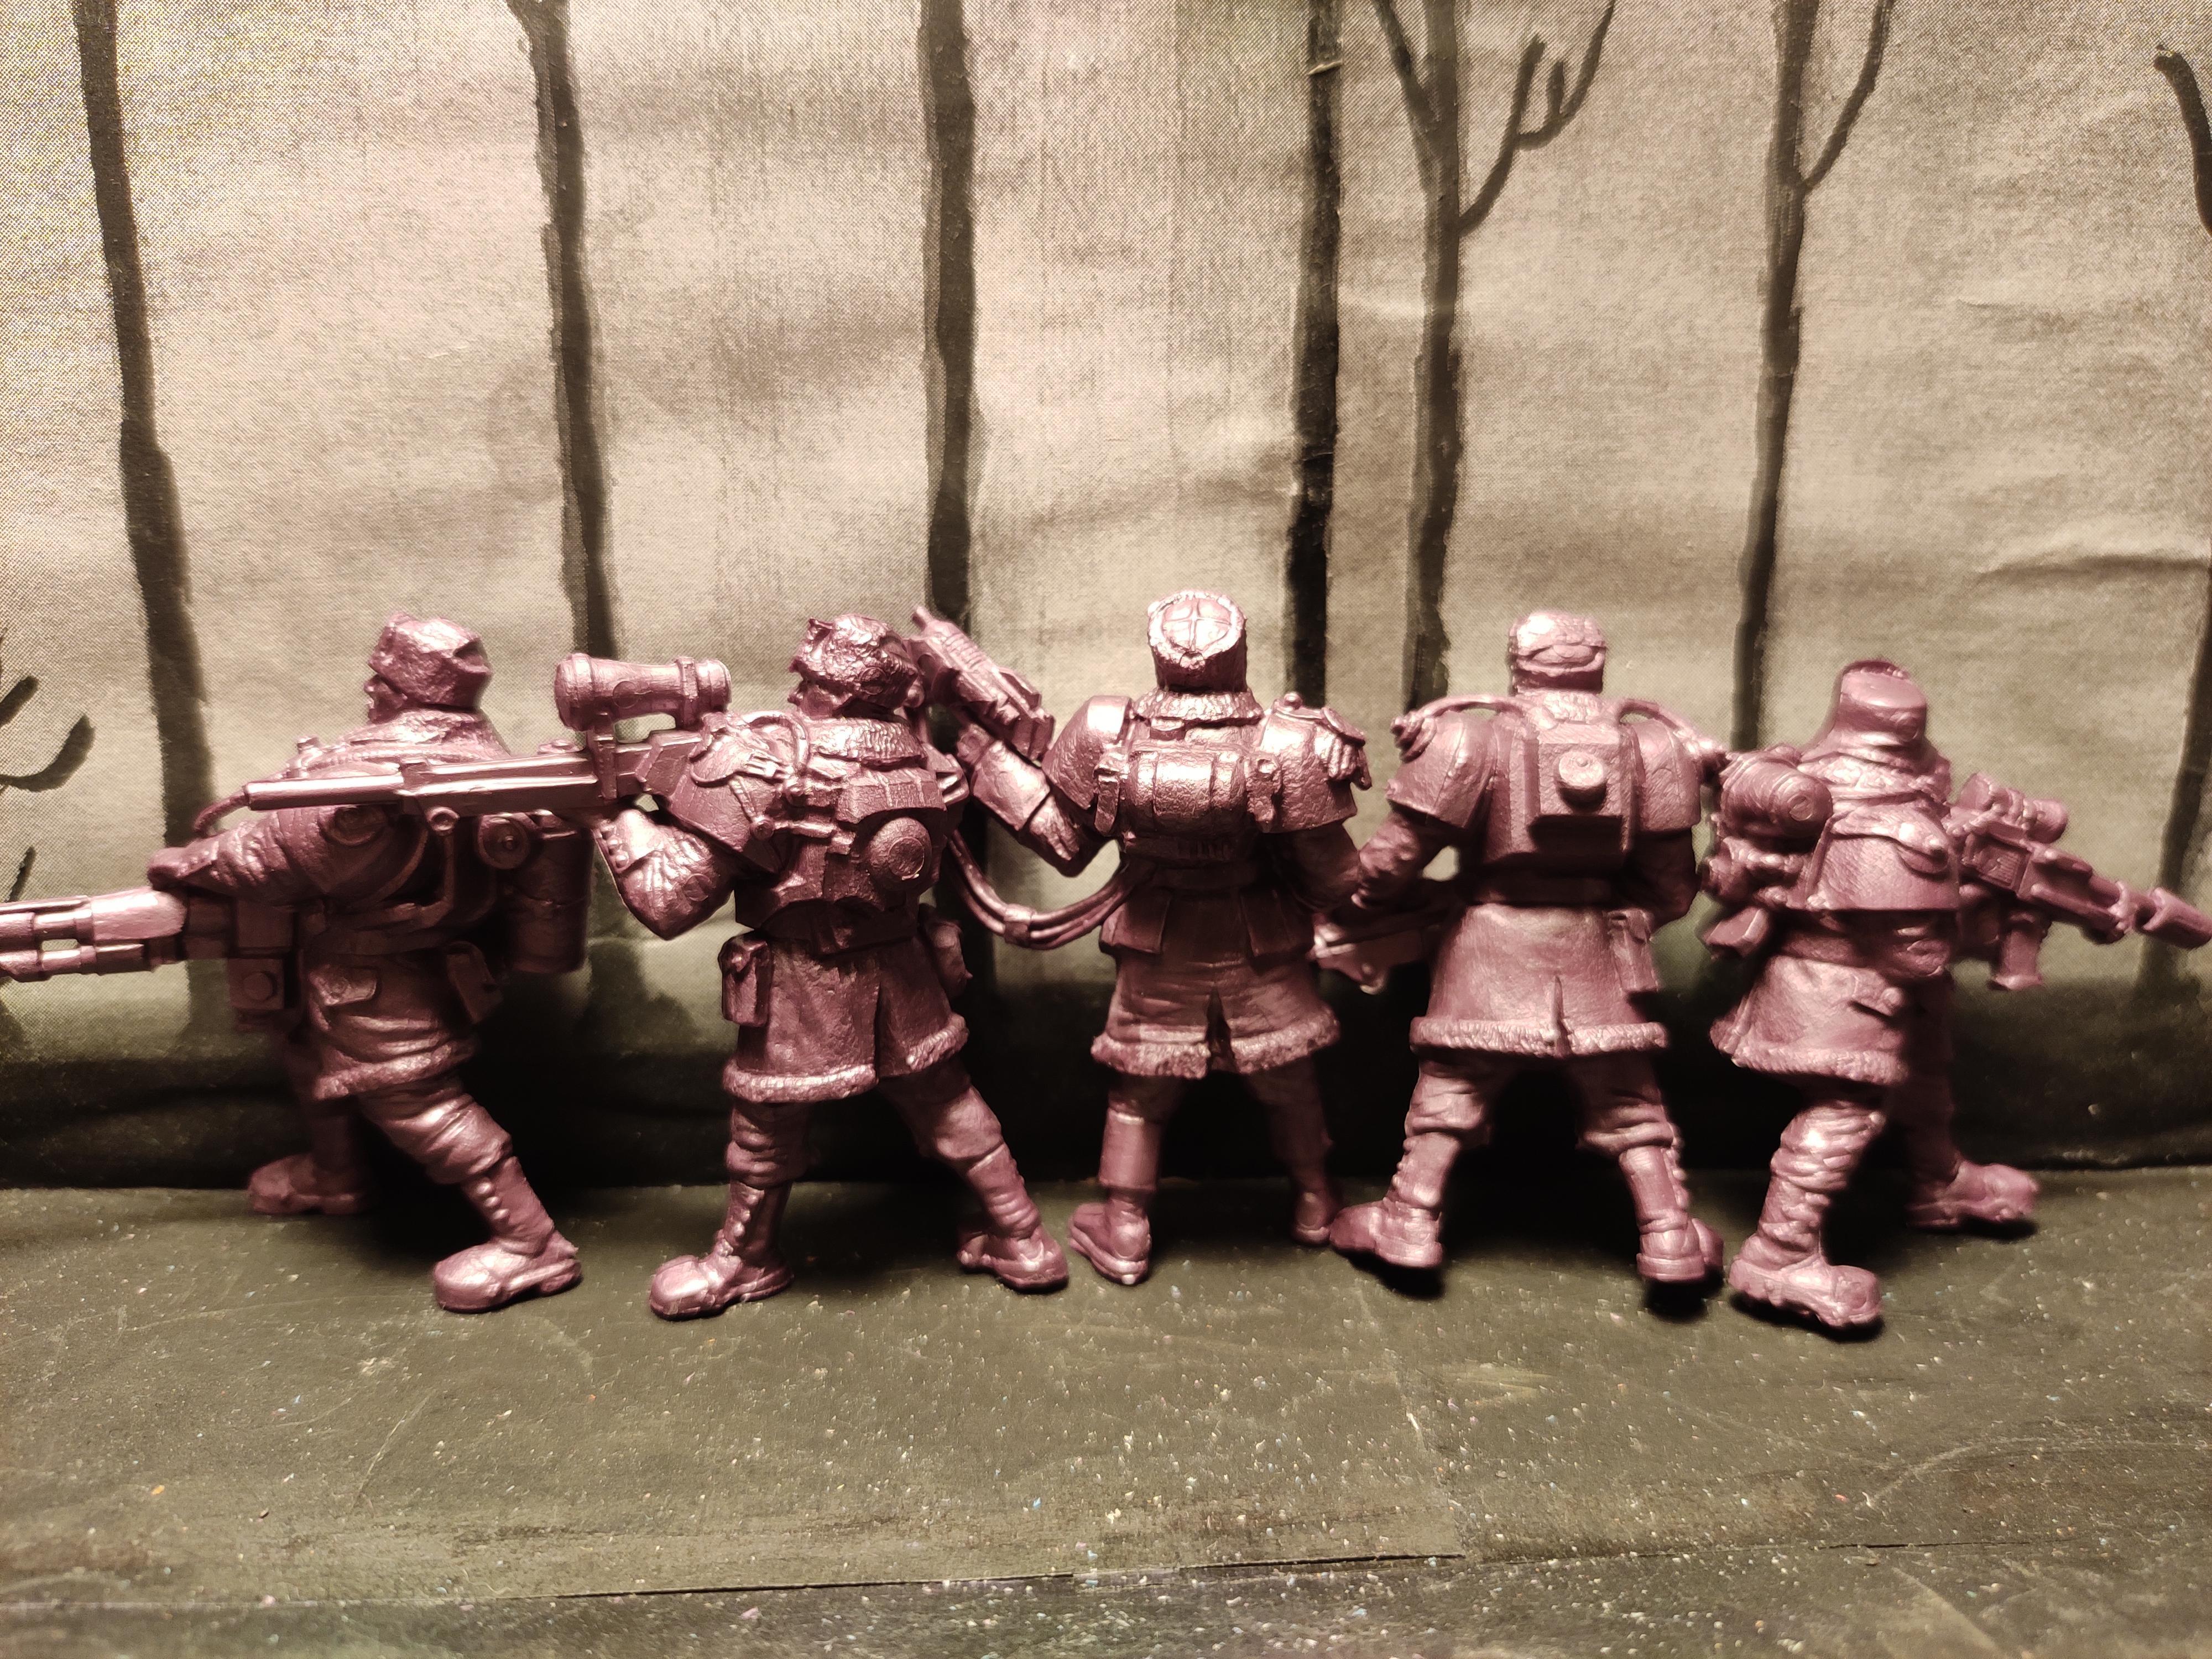 Битвы Fantasy, Autogun, Flamethrower, From Russia, Infantry, Machinegun, Regiment, Russians, Snipers, Soldier, Squad, Technolog, Tehnolog, Warriors, Work In Progress